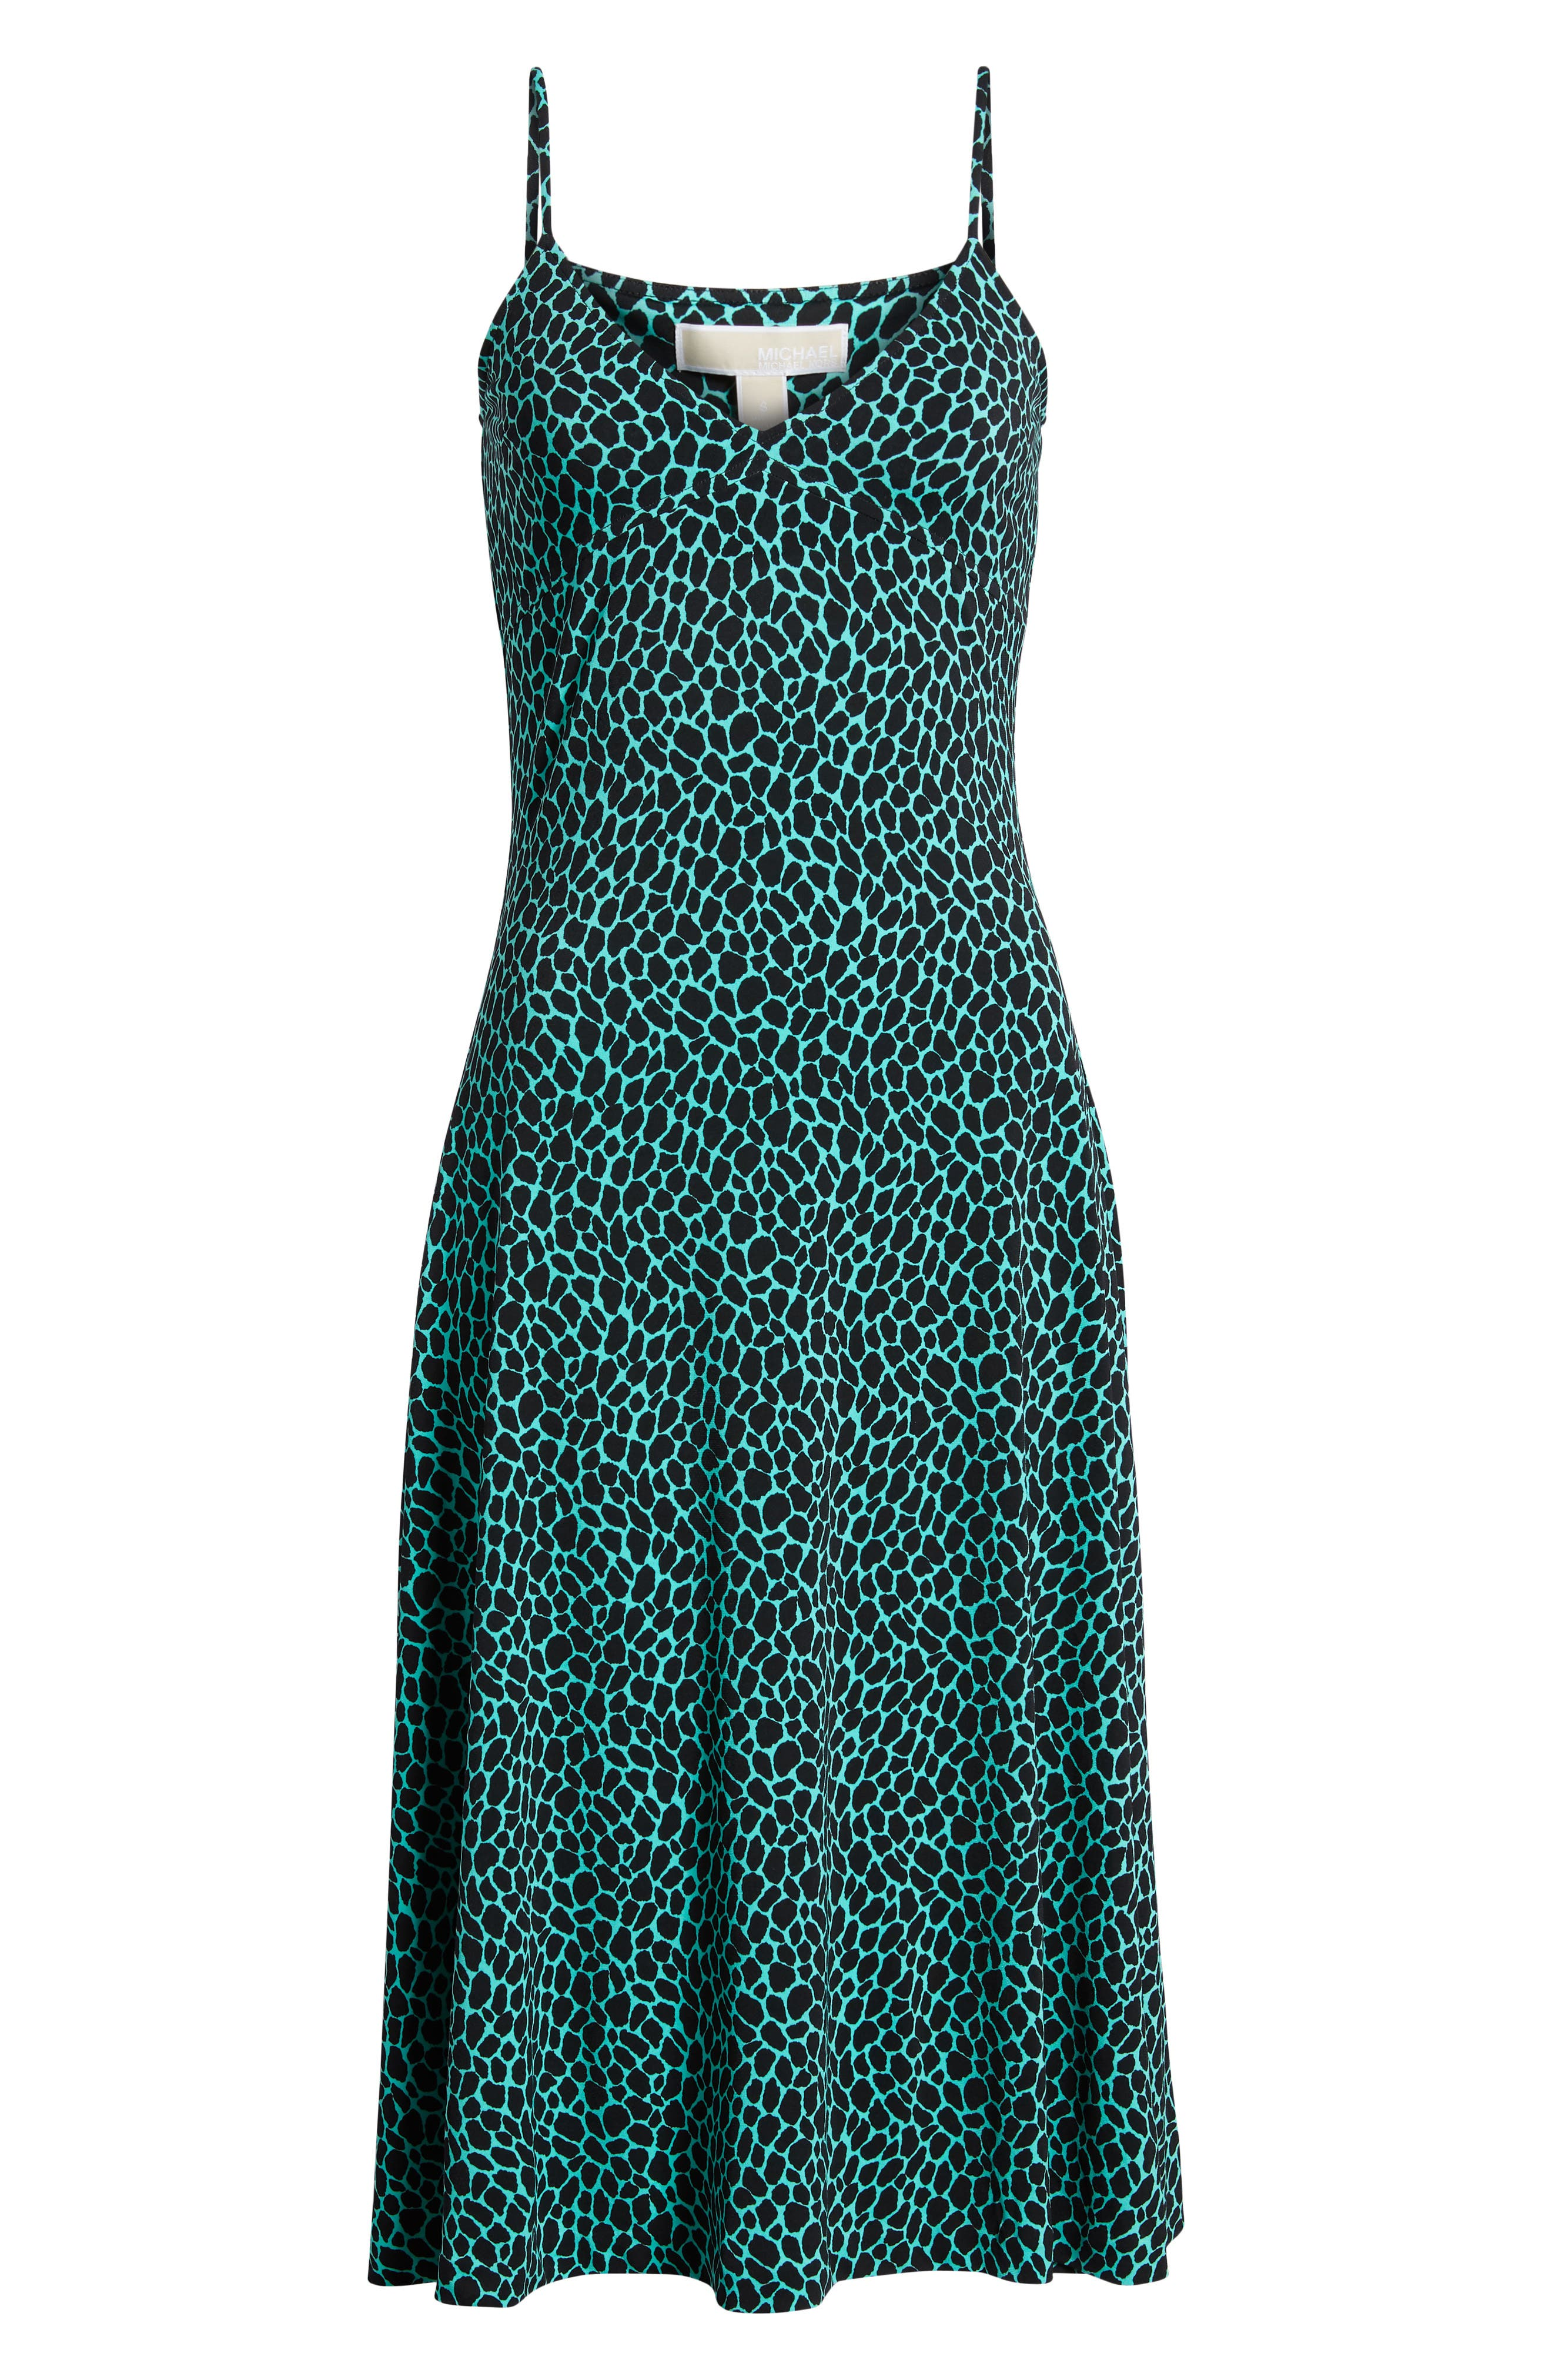 Graphic Leopard Tank Midi Dress,                             Alternate thumbnail 7, color,                             300